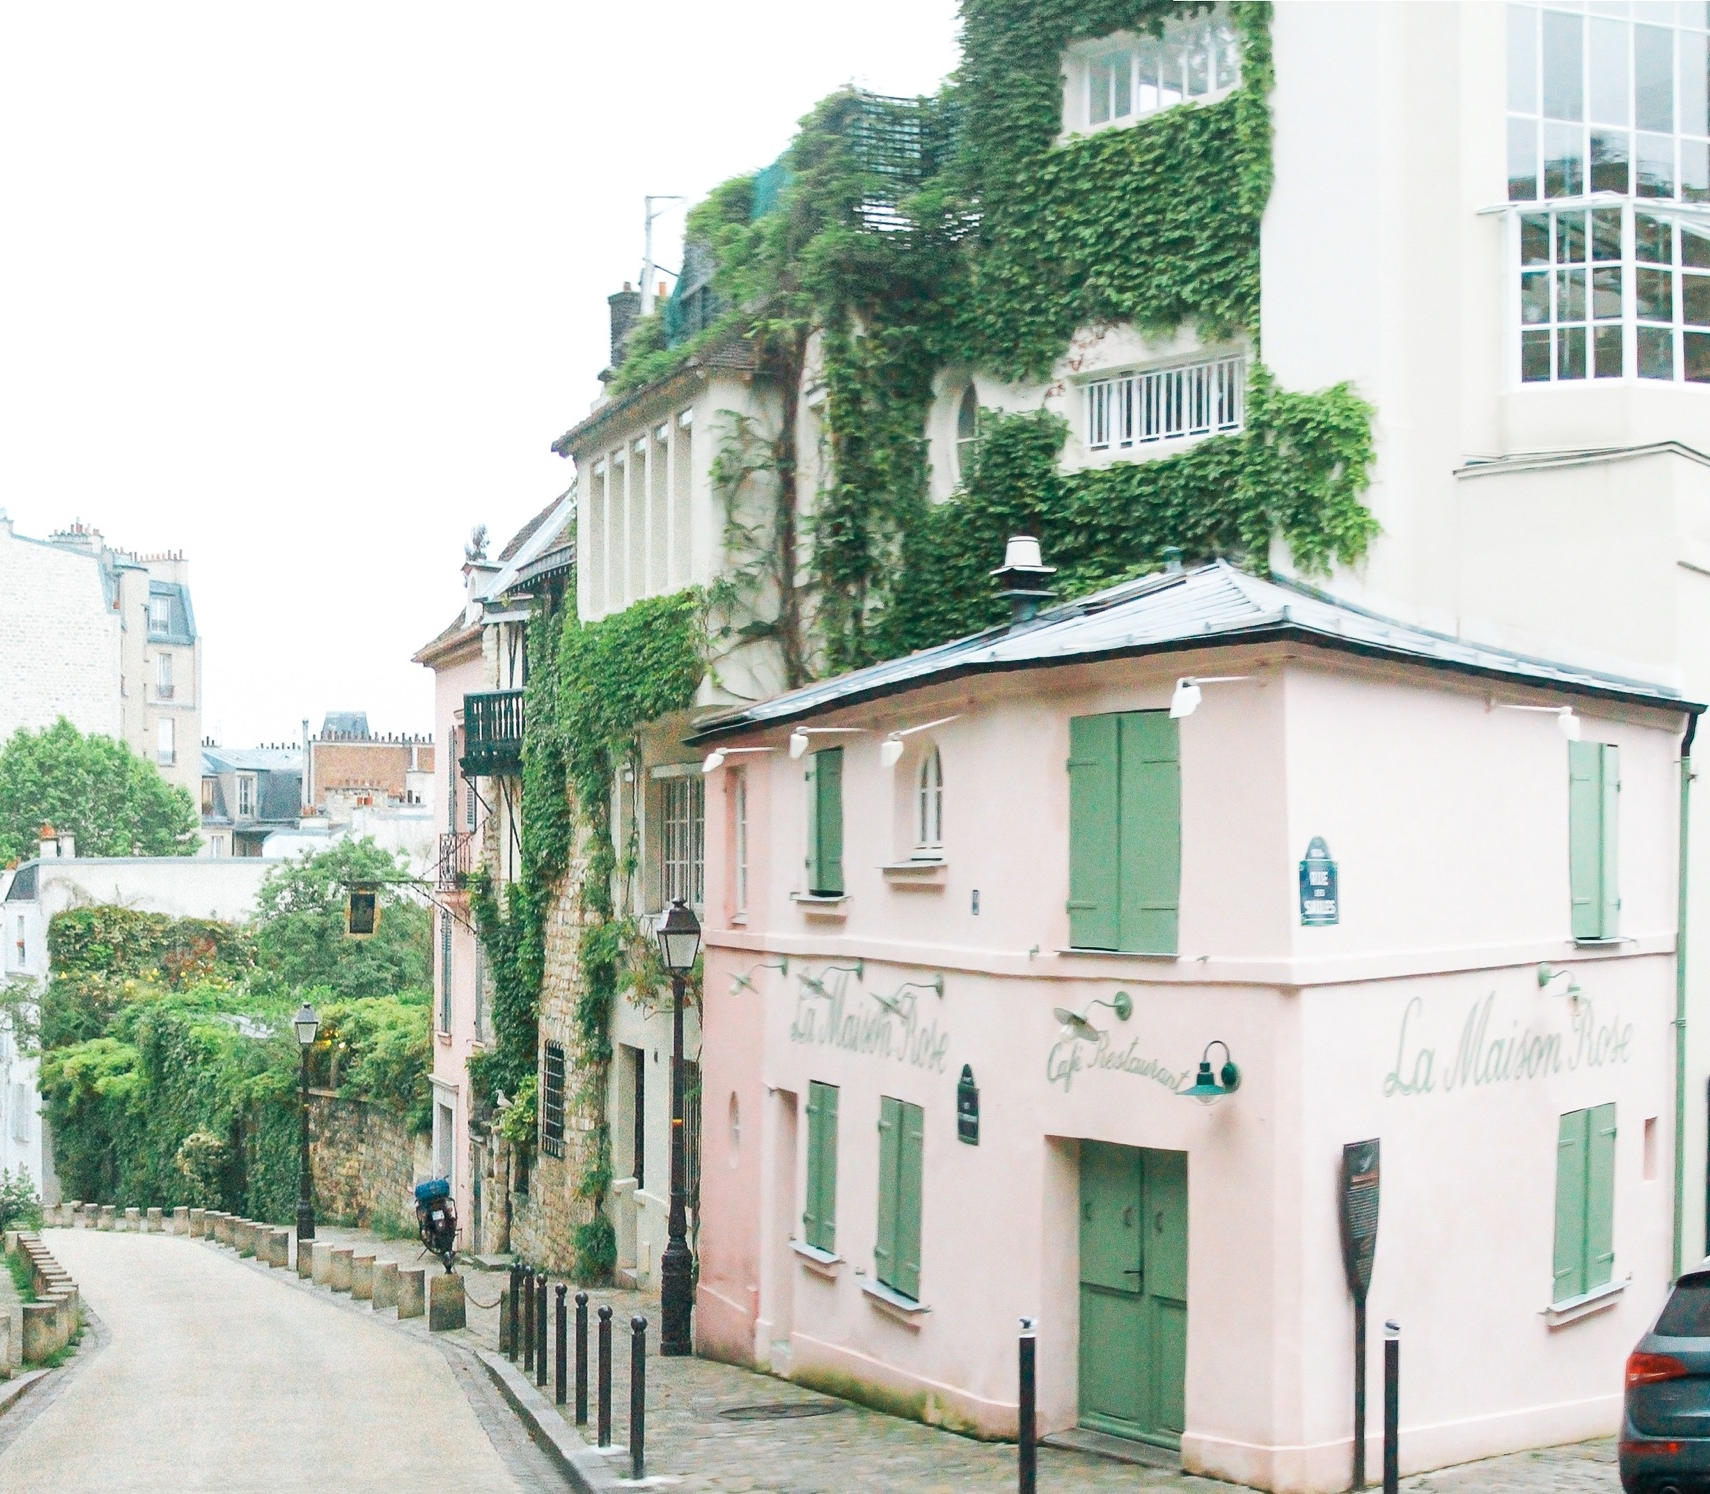 Paris-Walking-Guide-MonicaFrancis-23.jpeg